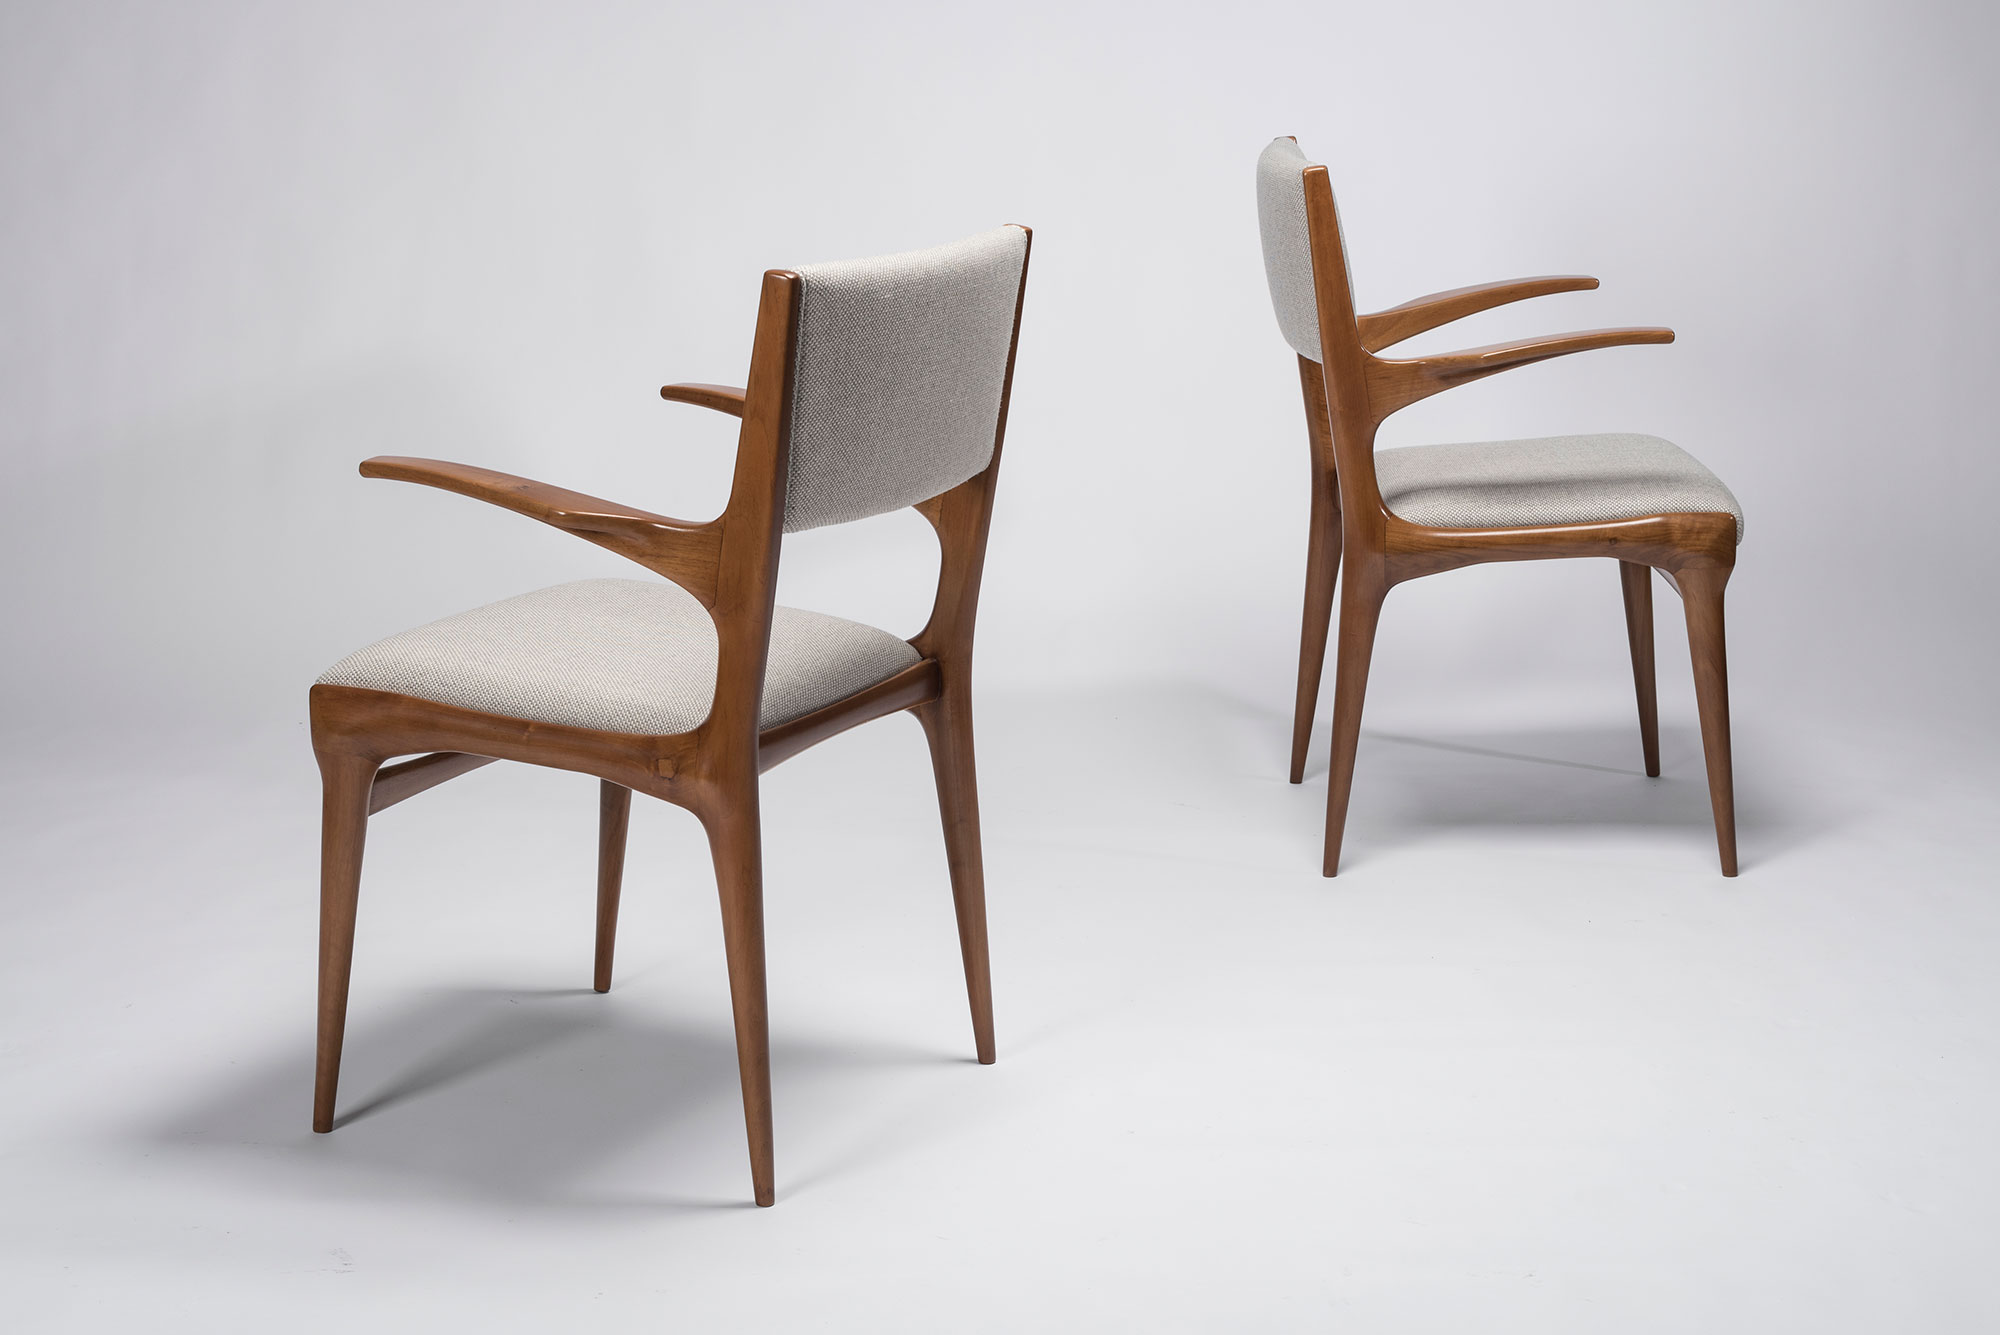 Carlo De Carli |                              Set of 8 chairs, model 1585 and model 162